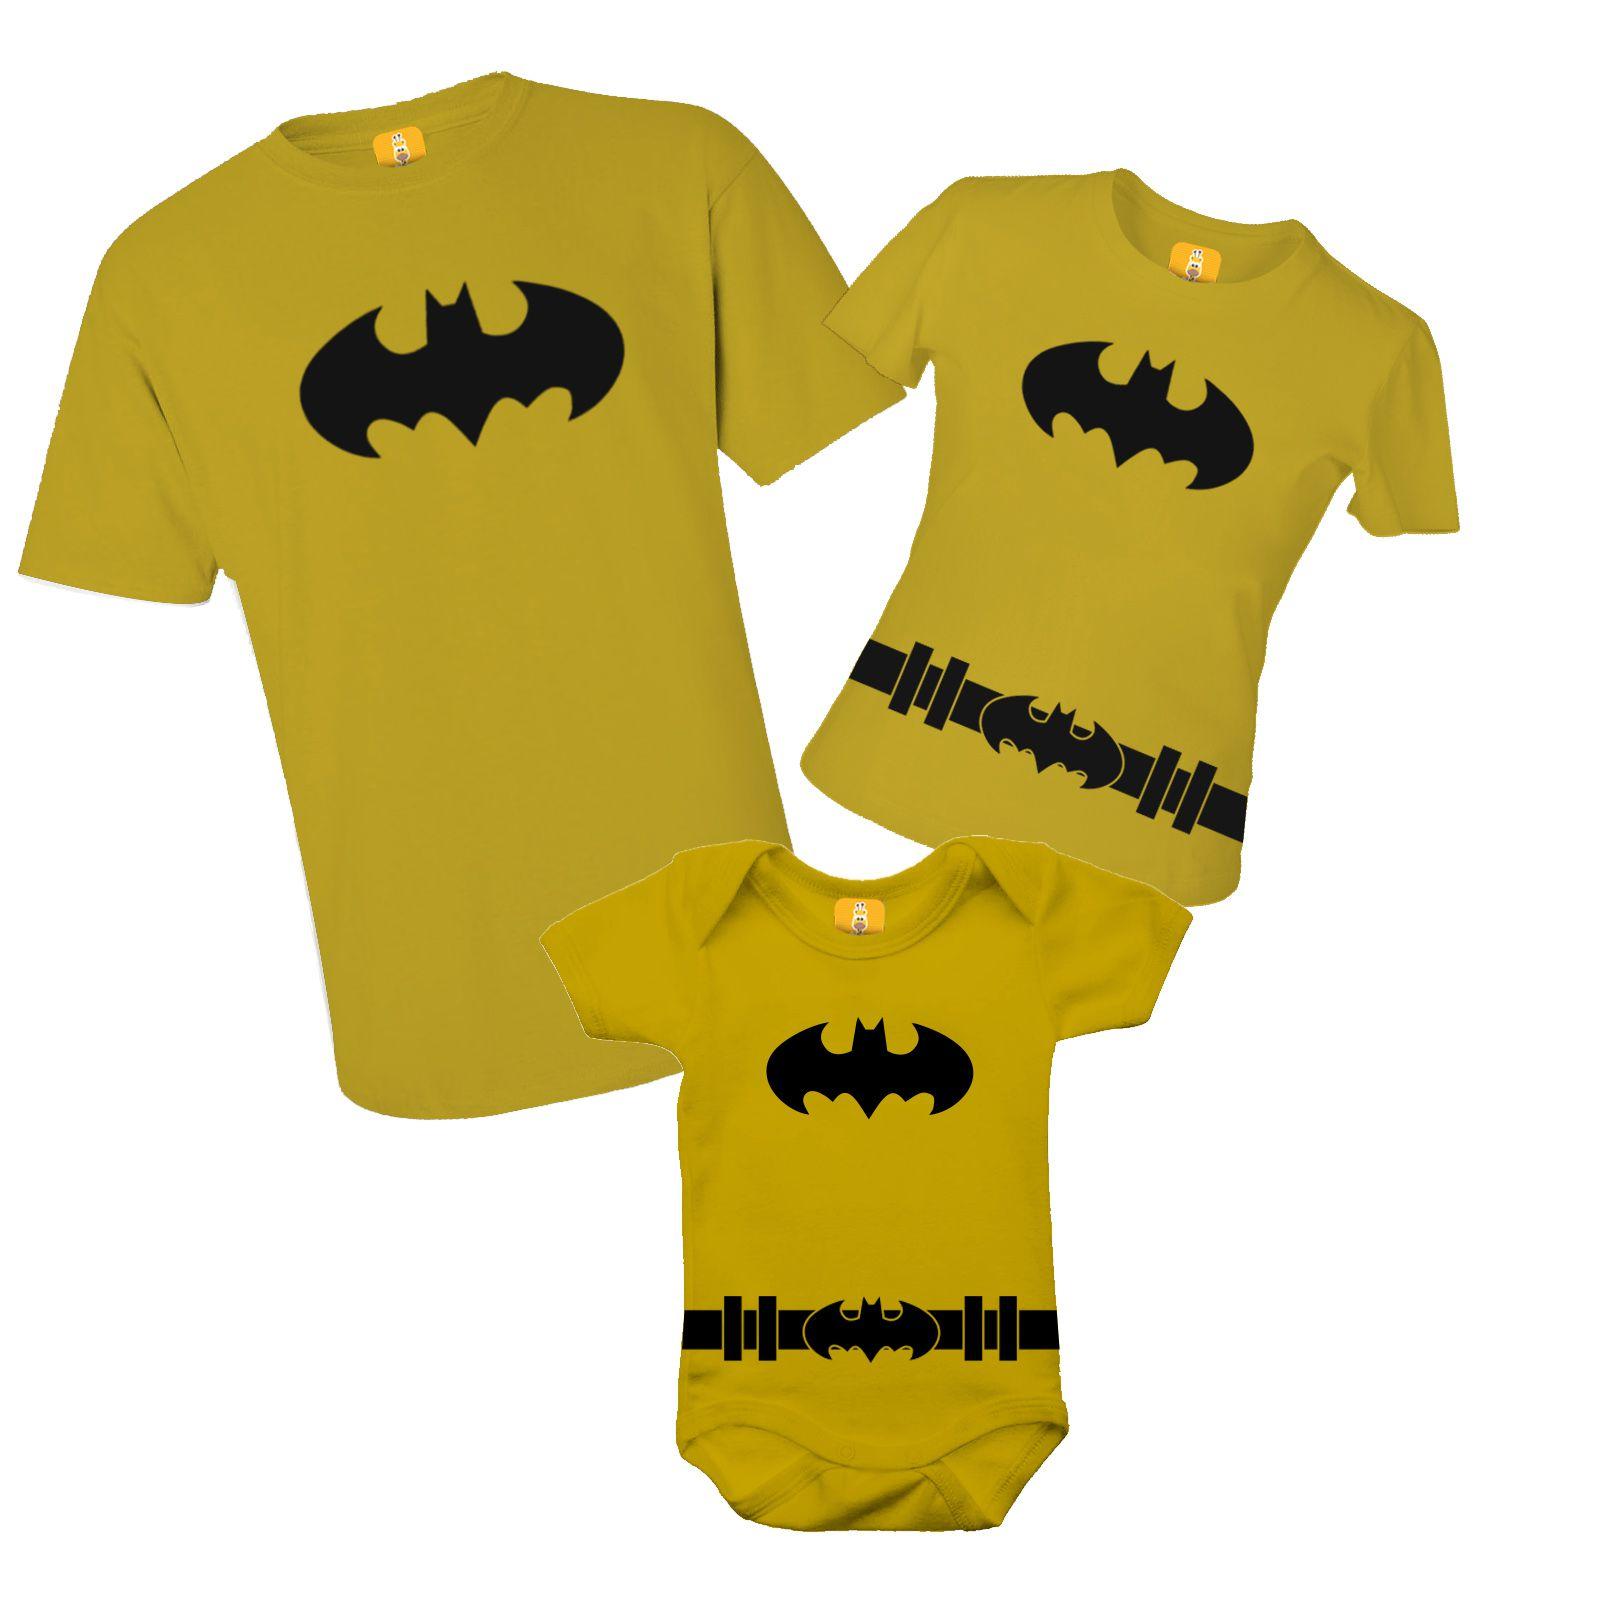 Kit camiseta e body do Batman